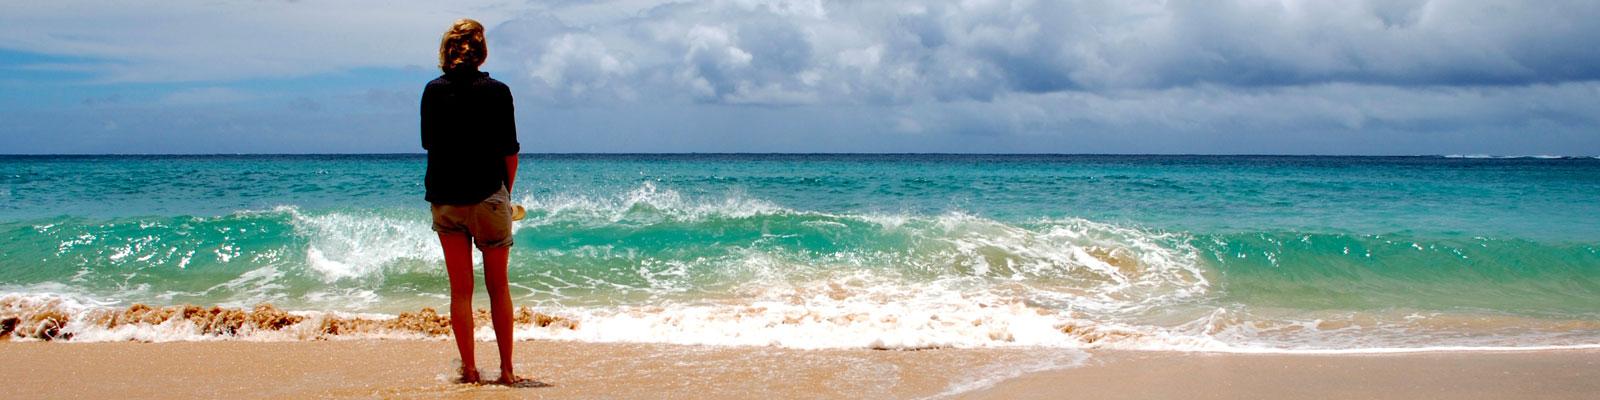 Vegan Traveler Blogs & Videos - Kauai Beach - Vegan Travel